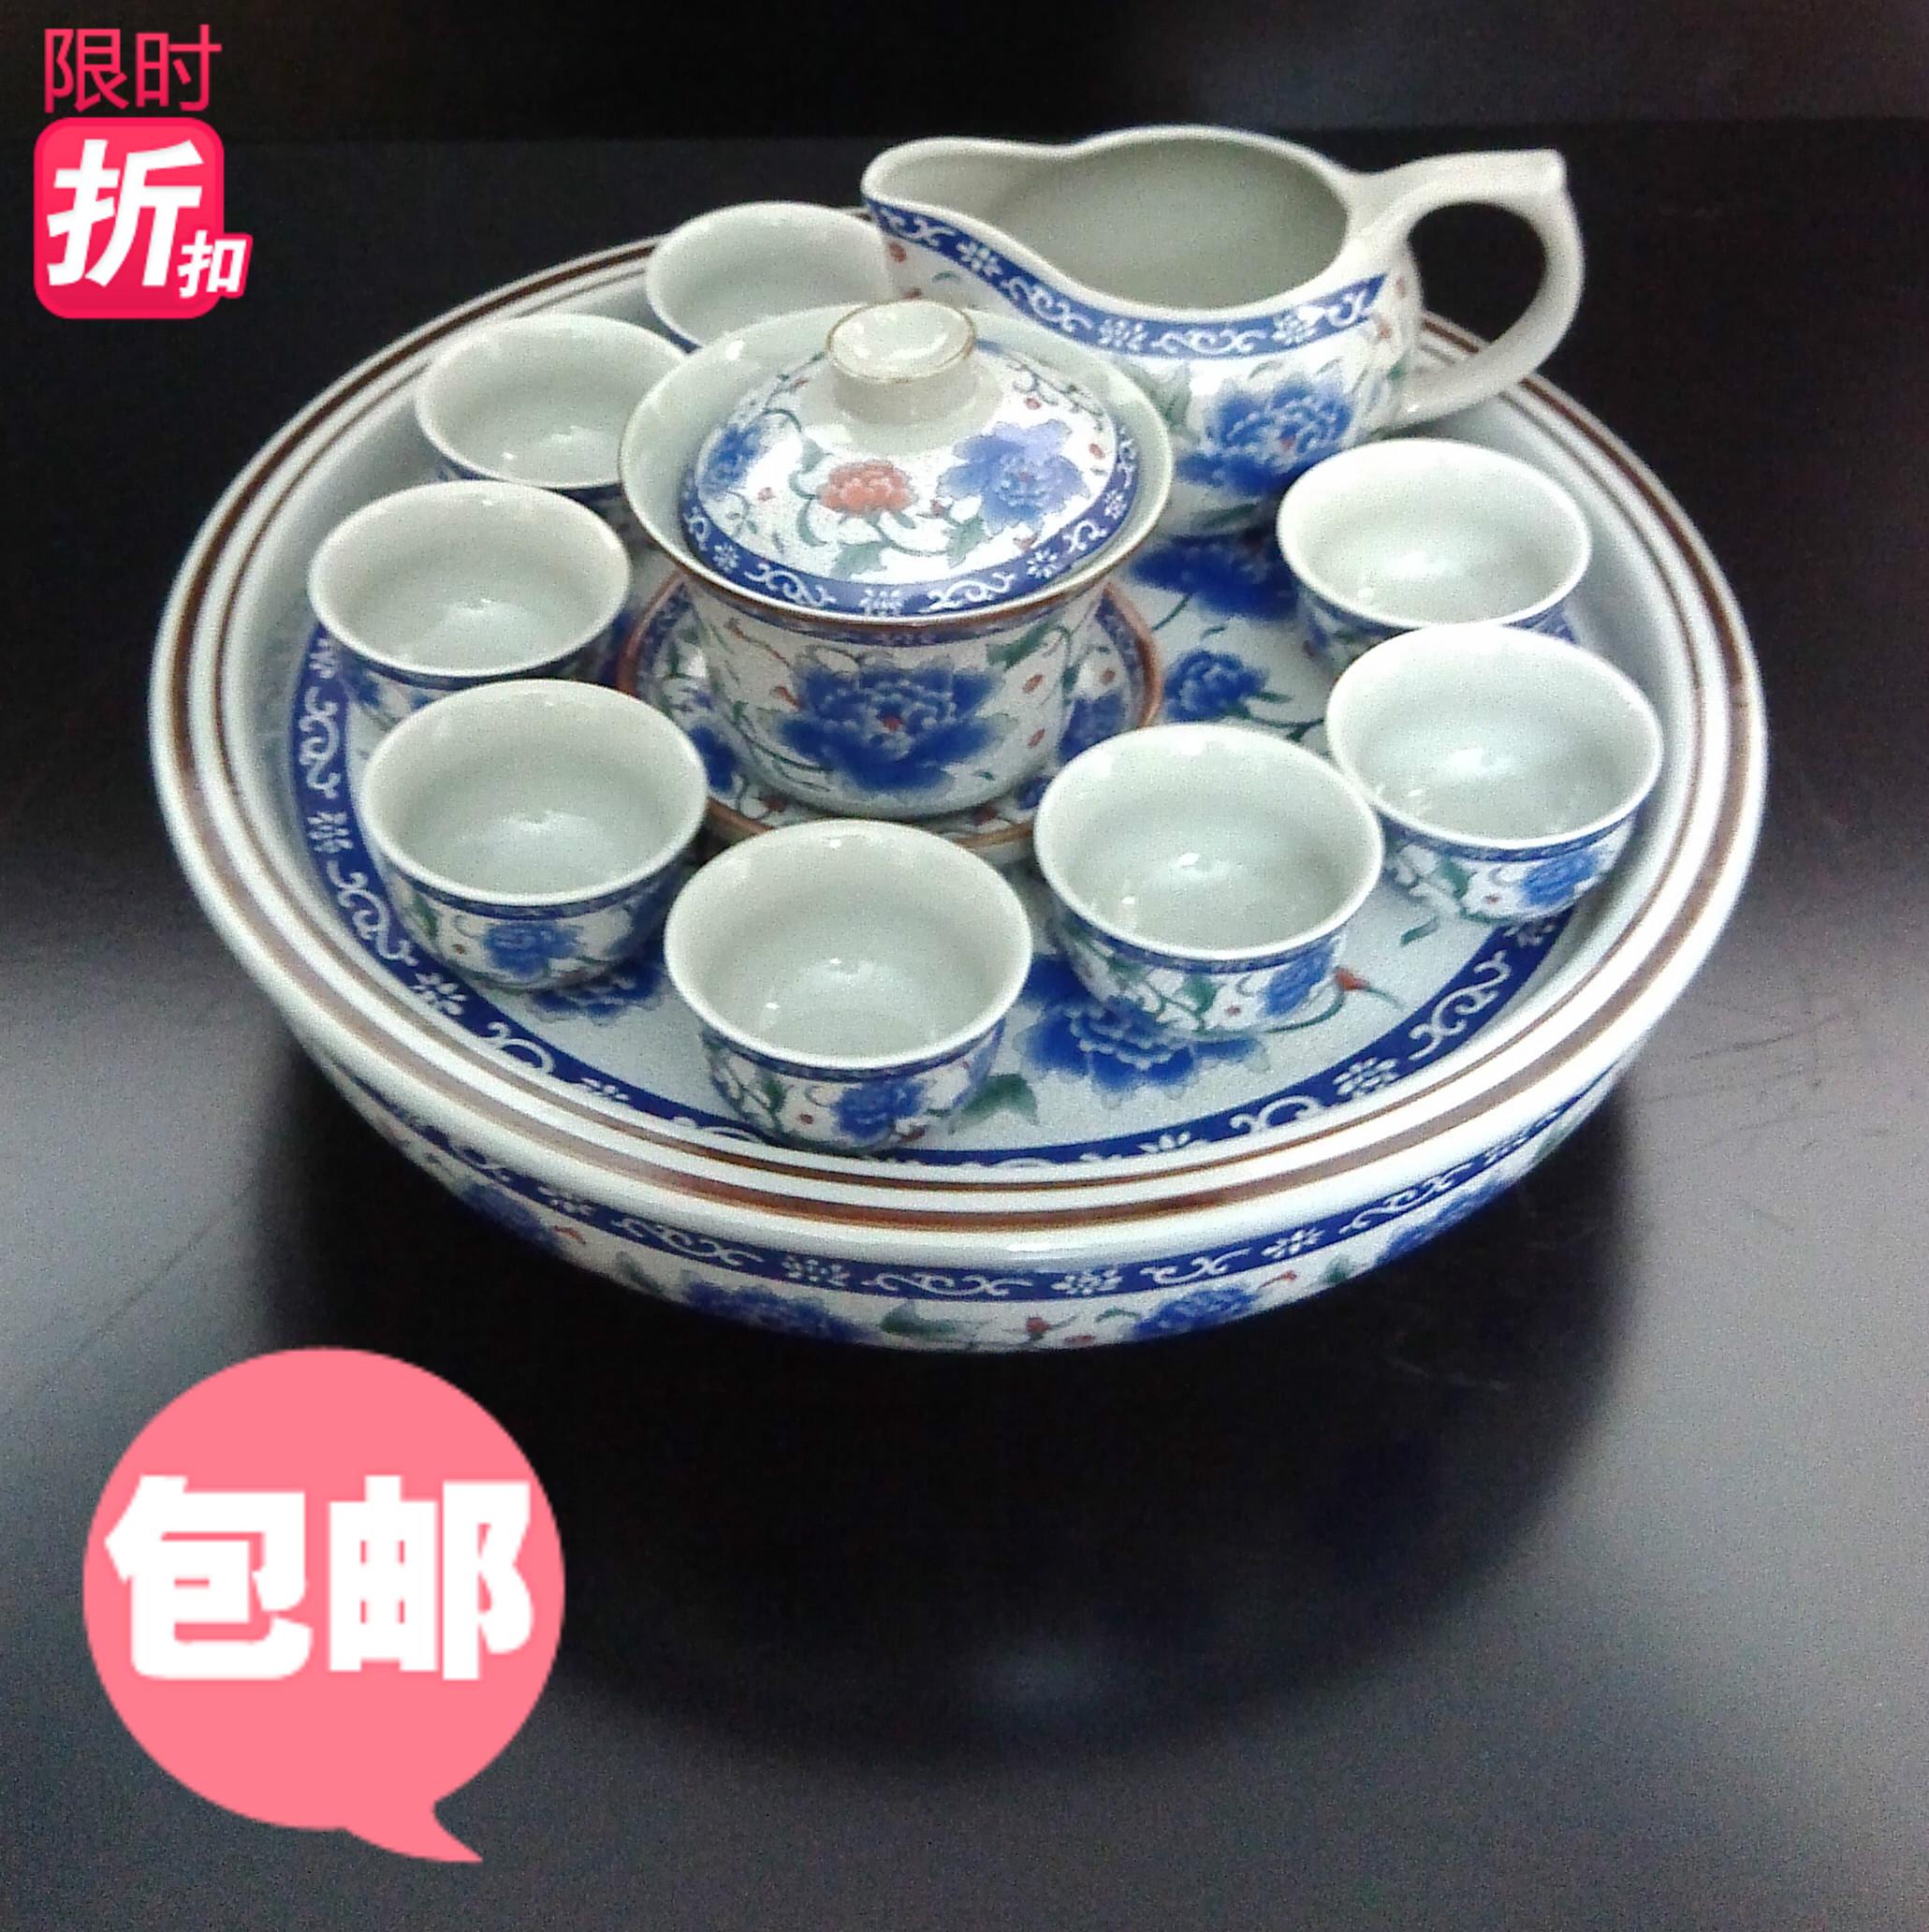 Набор для чайной церемонии Tea chain 10/set 002